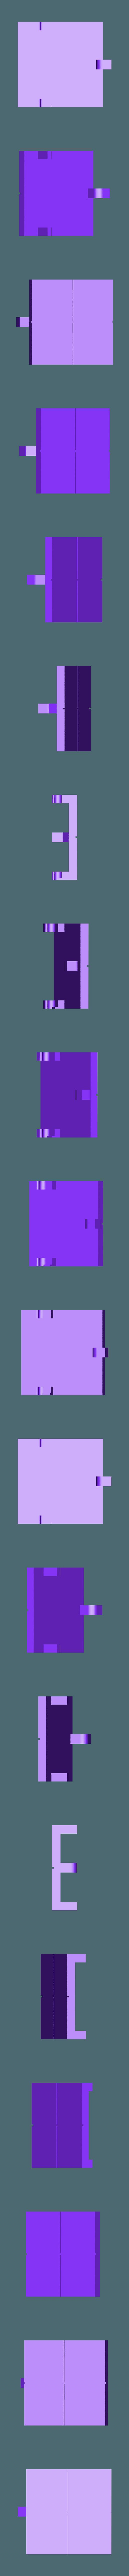 Parte_lateral_corta.stl Download free STL file Tablero de ajedrez desplegable • 3D print object, alexanderegido